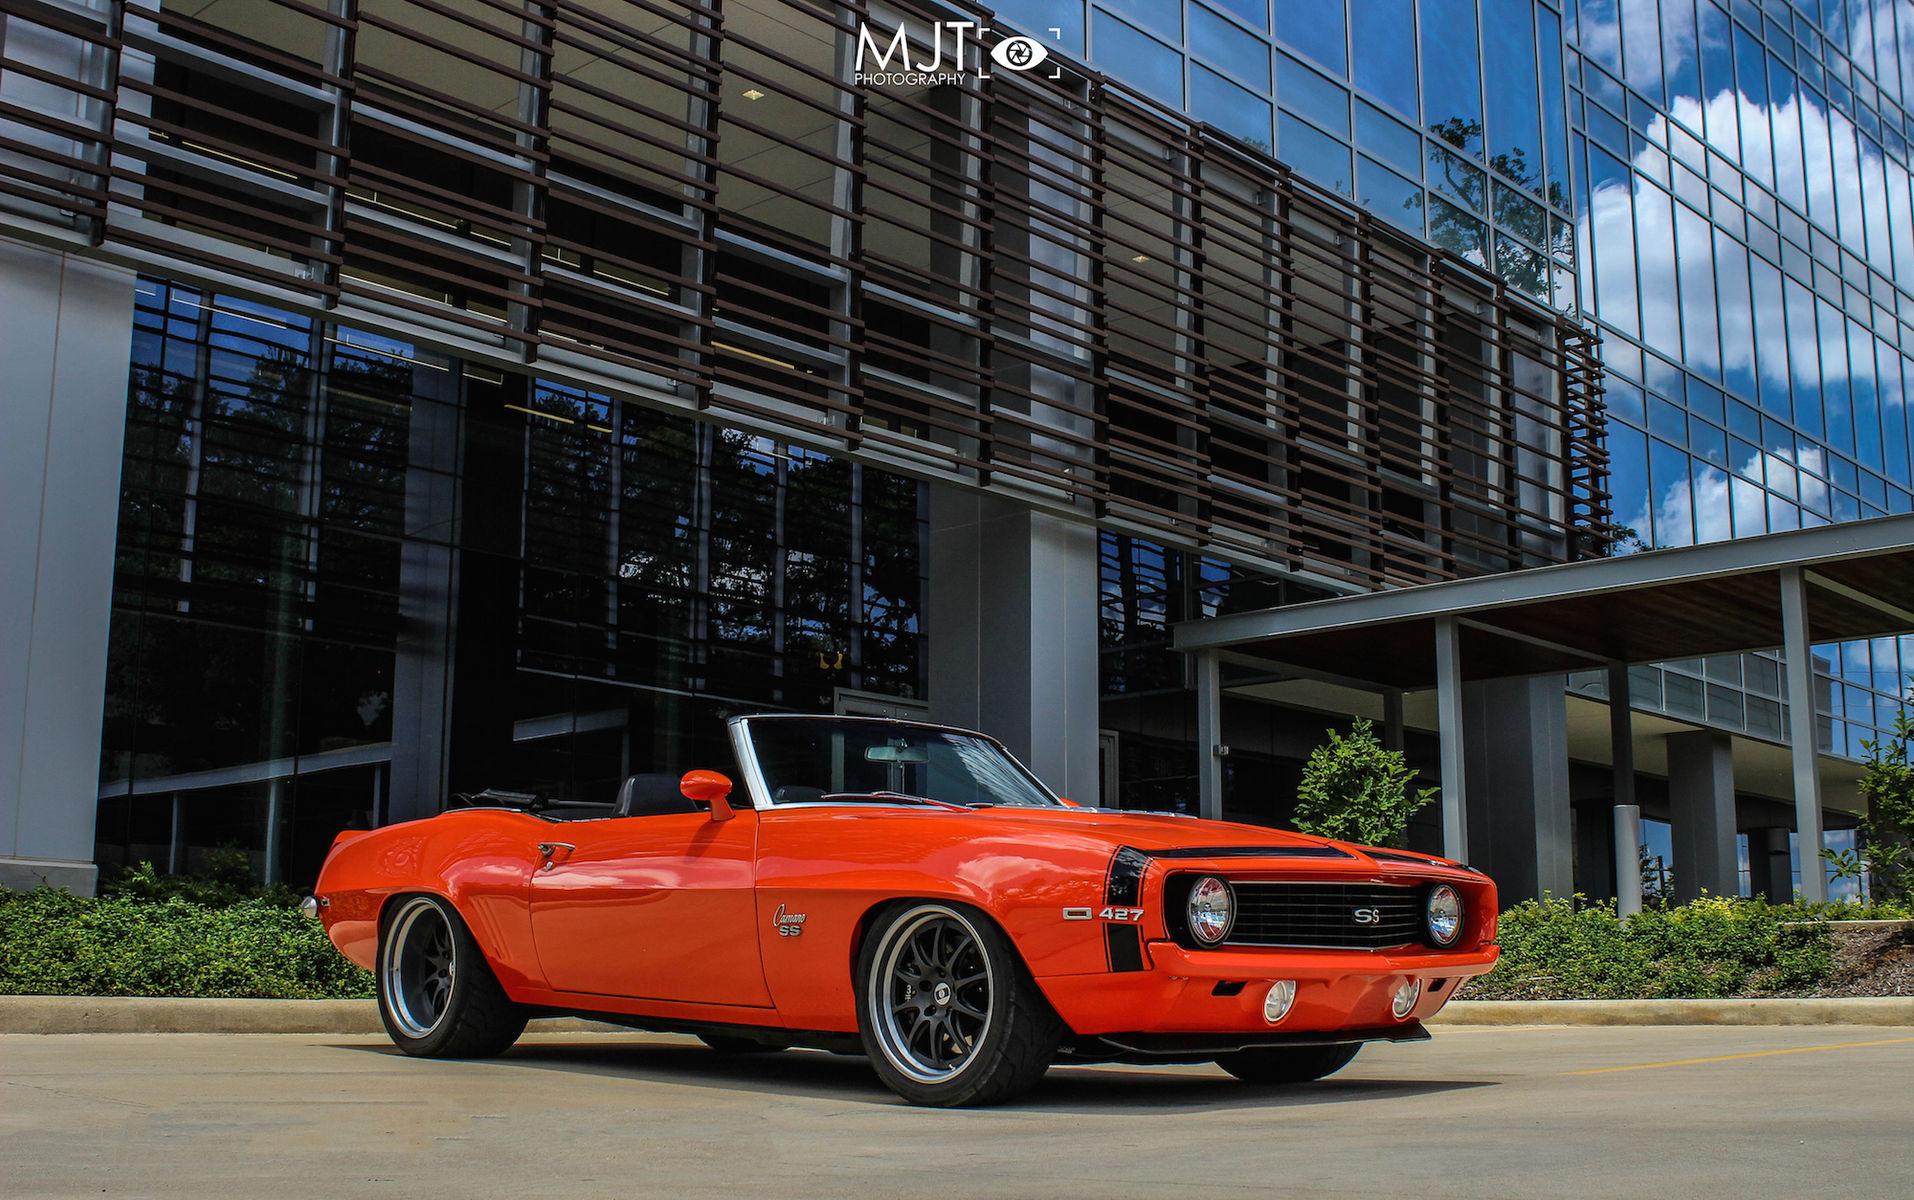 1969 Chevrolet Camaro | Tony's Deviate Motoring '69 Camaro Convertible on Forgeline GZ3 Wheels